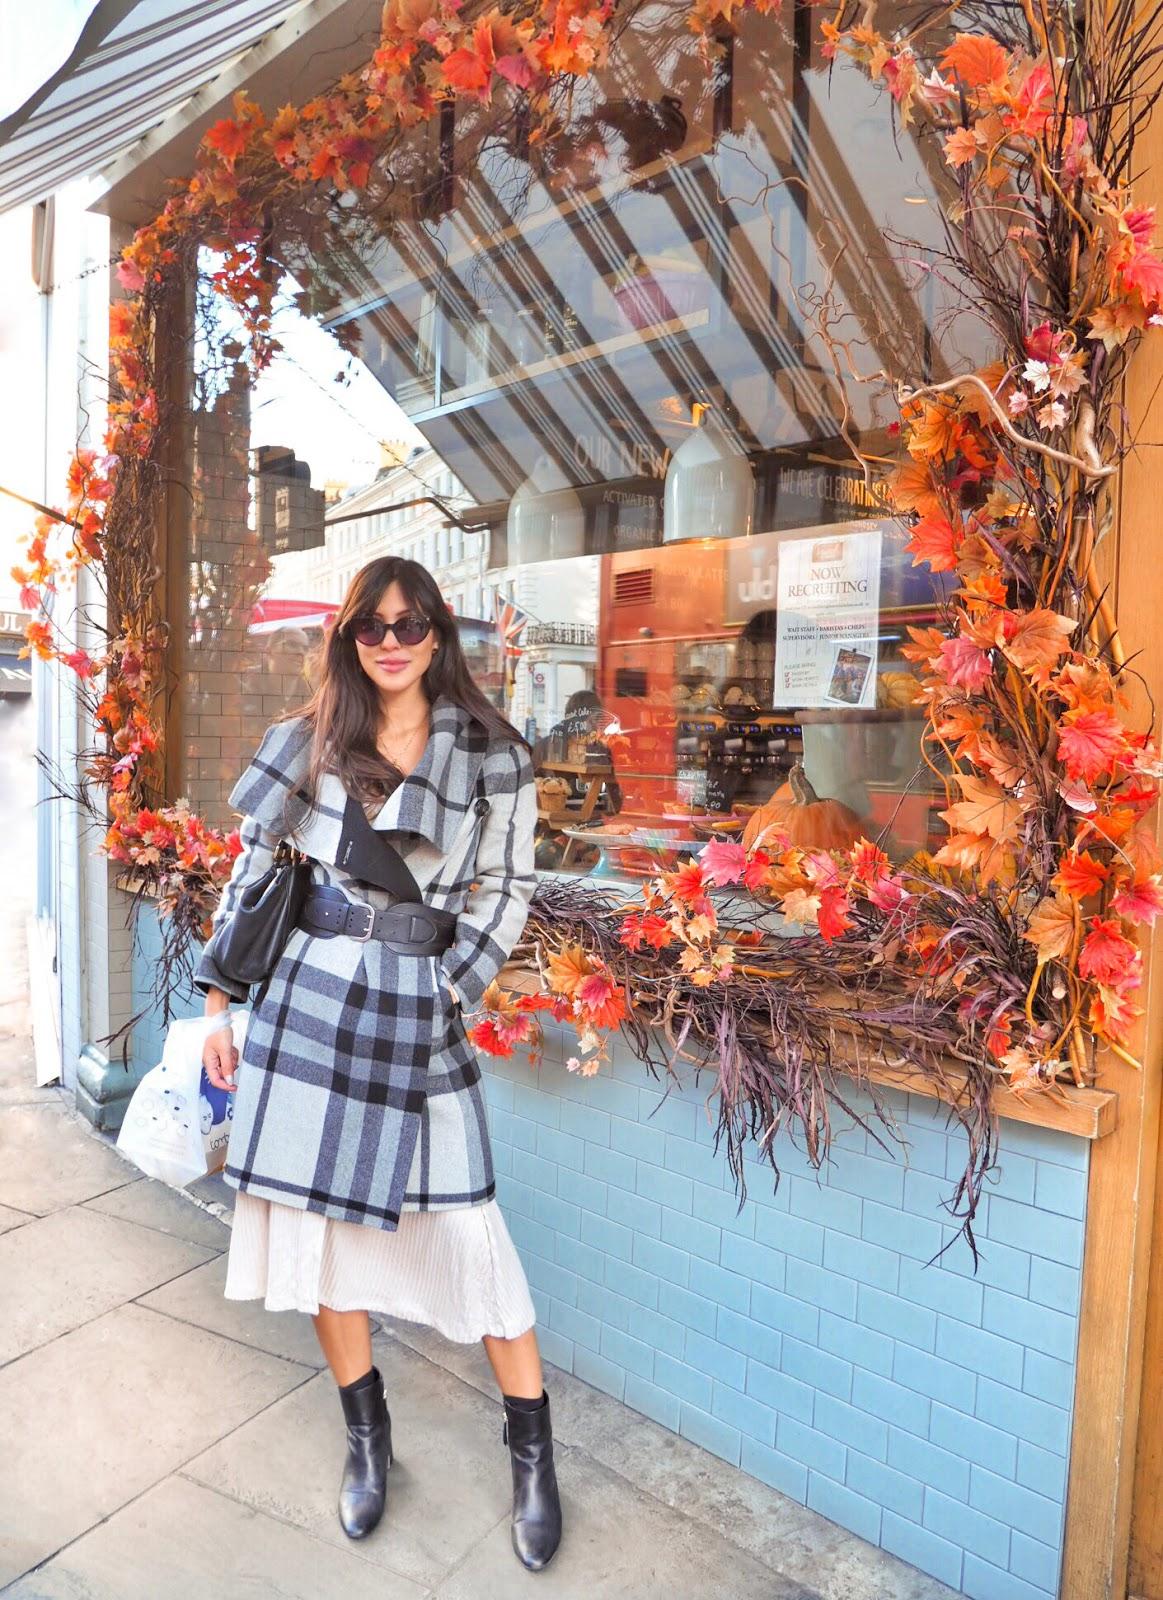 Euriental | luxury travel & style | an afternoon in Kensington, London